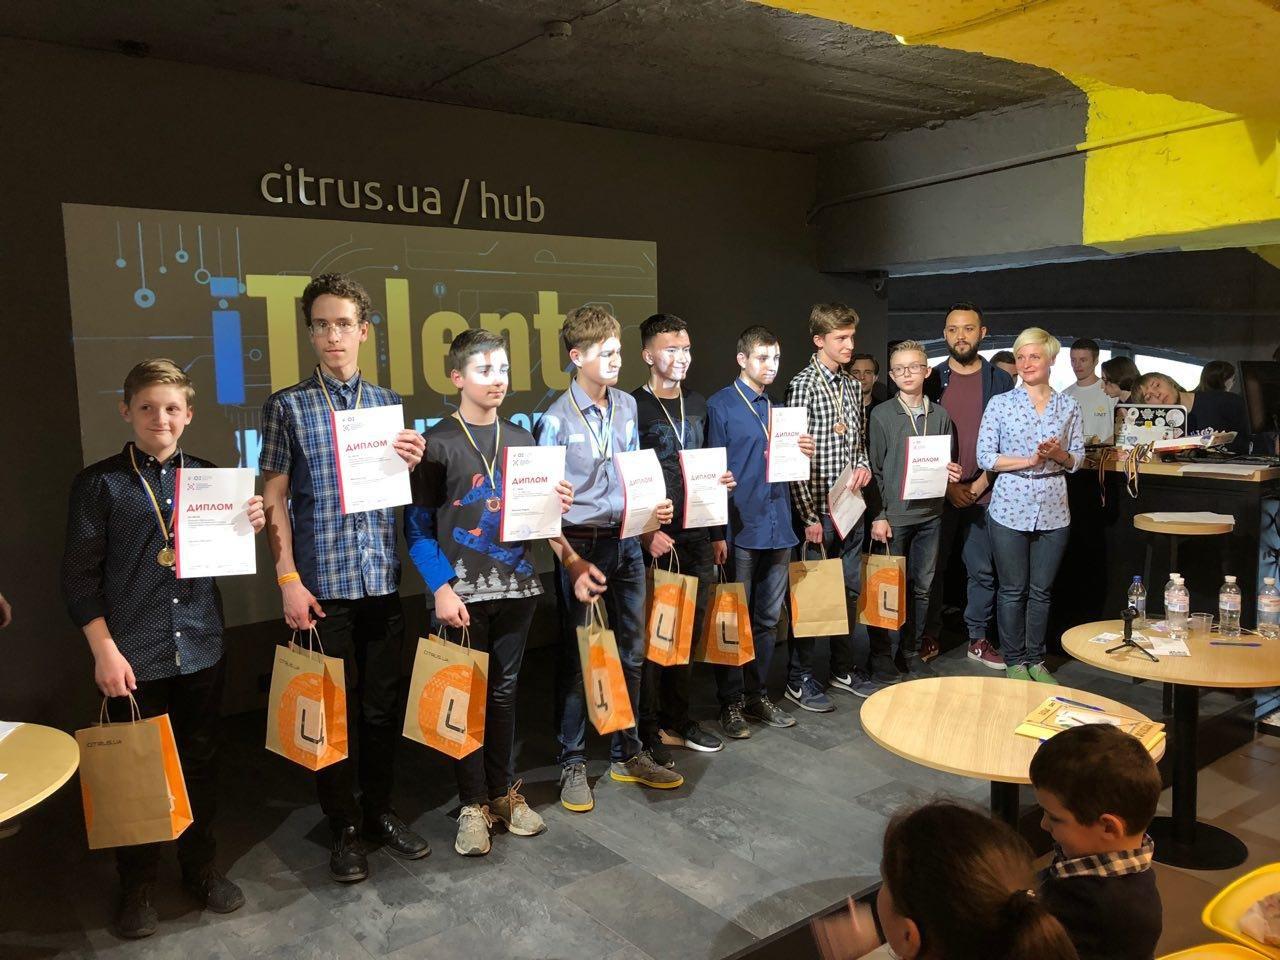 Четверо юных одесситов достойно представили наш регион на Всеукраинском конкурсе «iTalent», фото-6